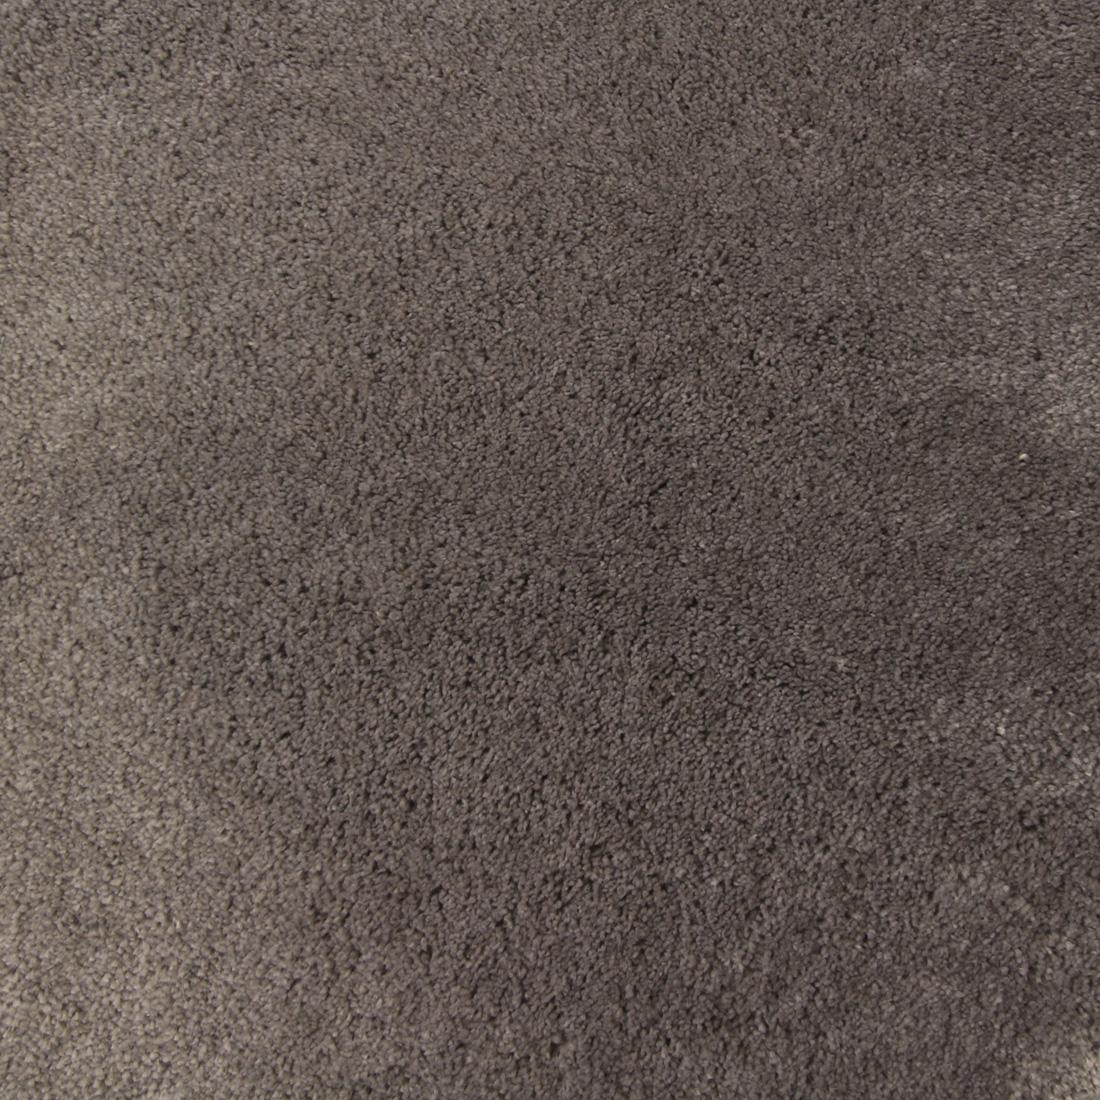 Rond Vloerkleed Xilento Touch Furrow (extra zacht)